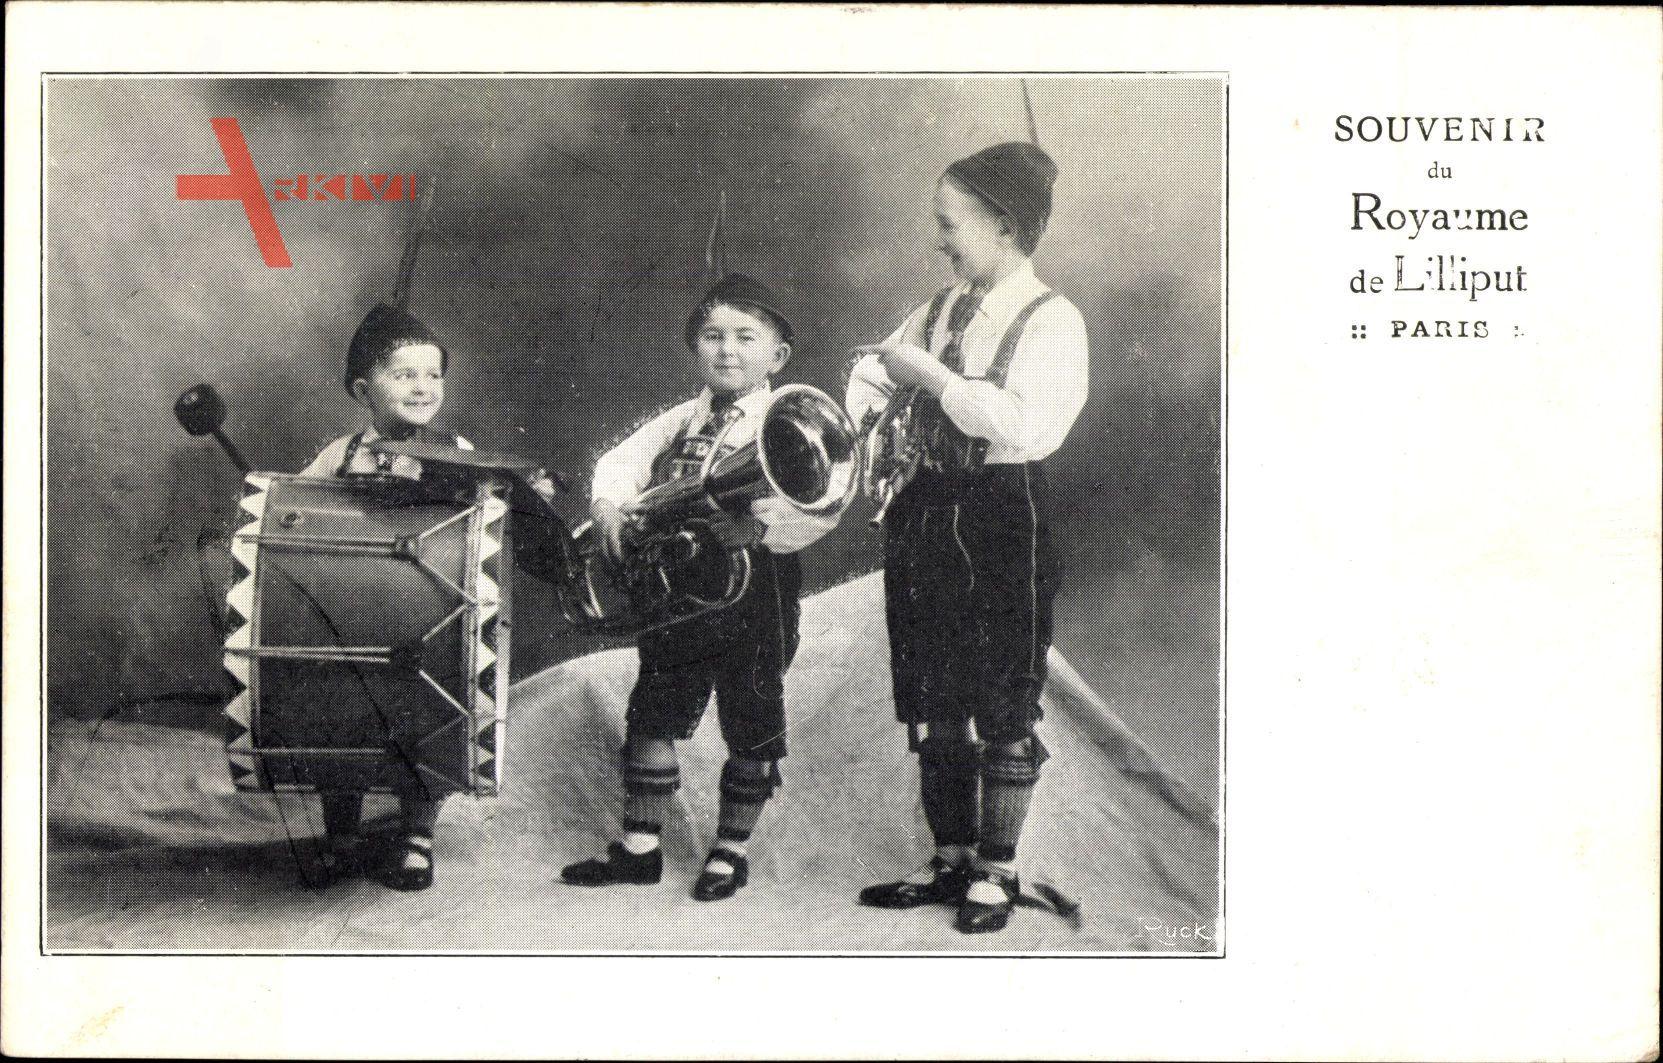 Souvenir du Royaume de Liliput, Paris, Liliputaner mit Musikinstrumenten